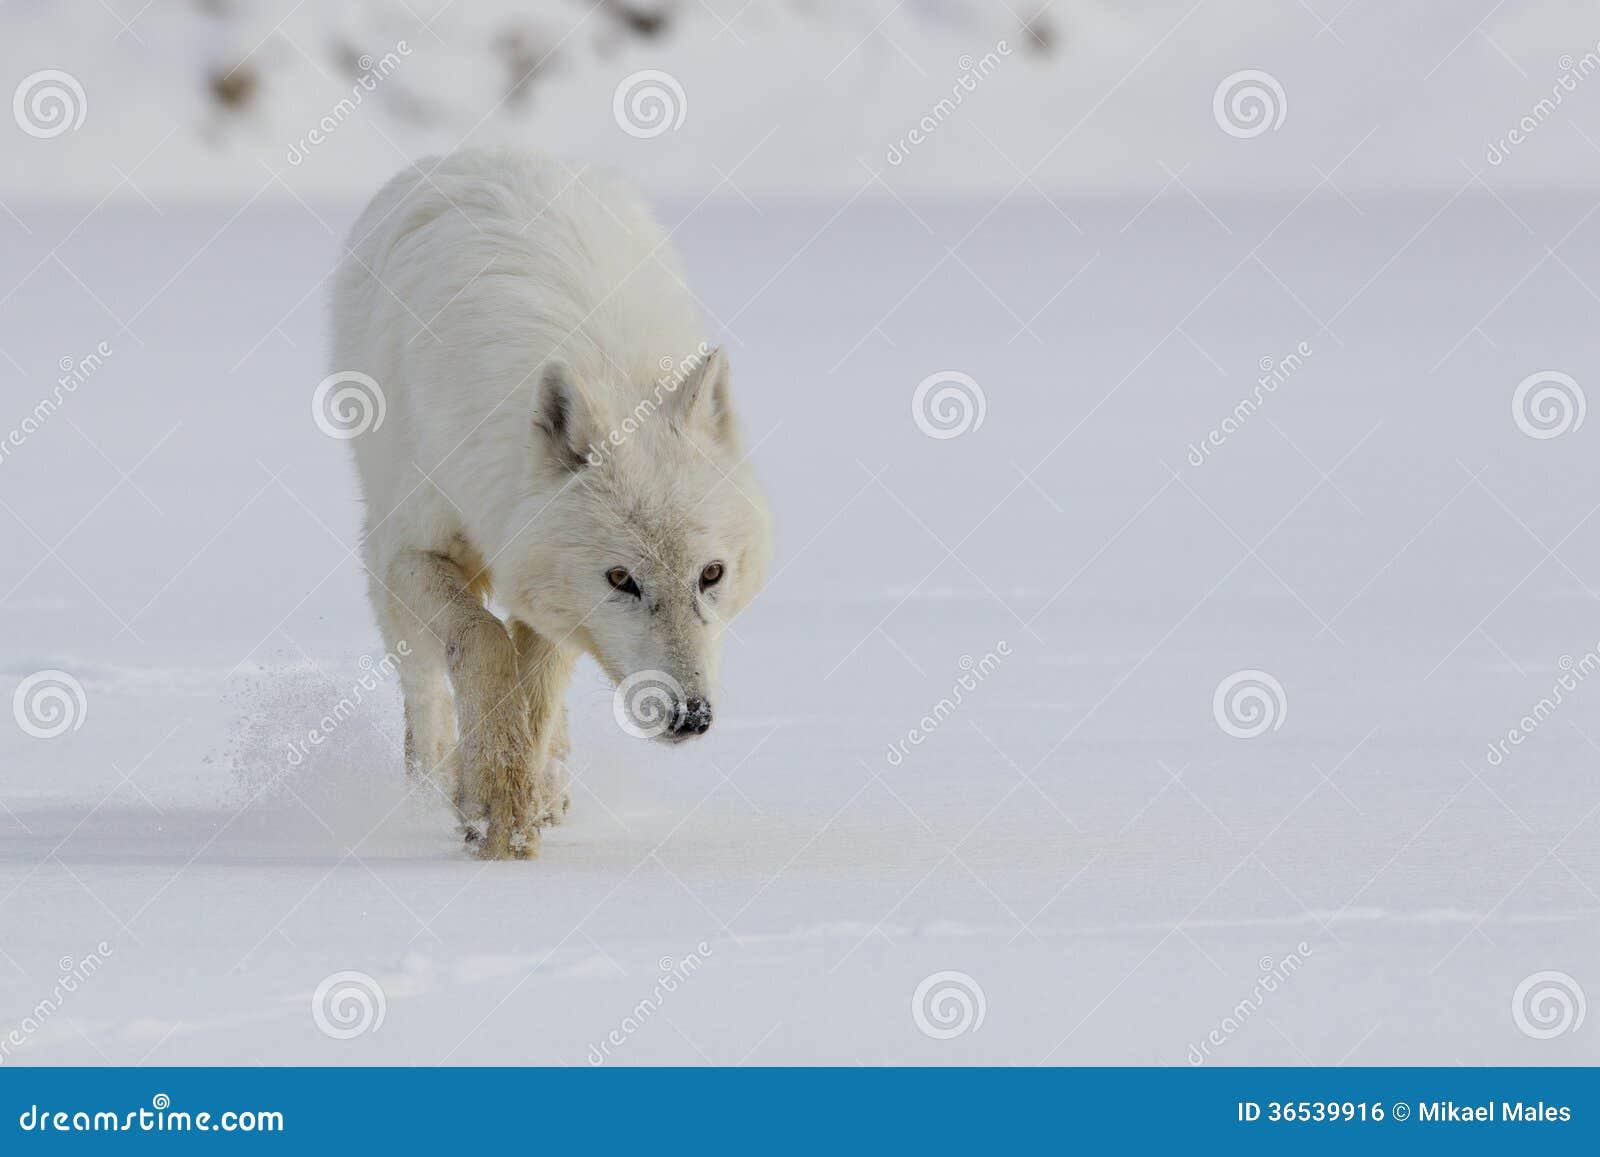 Arctic wolf in snow - photo#21